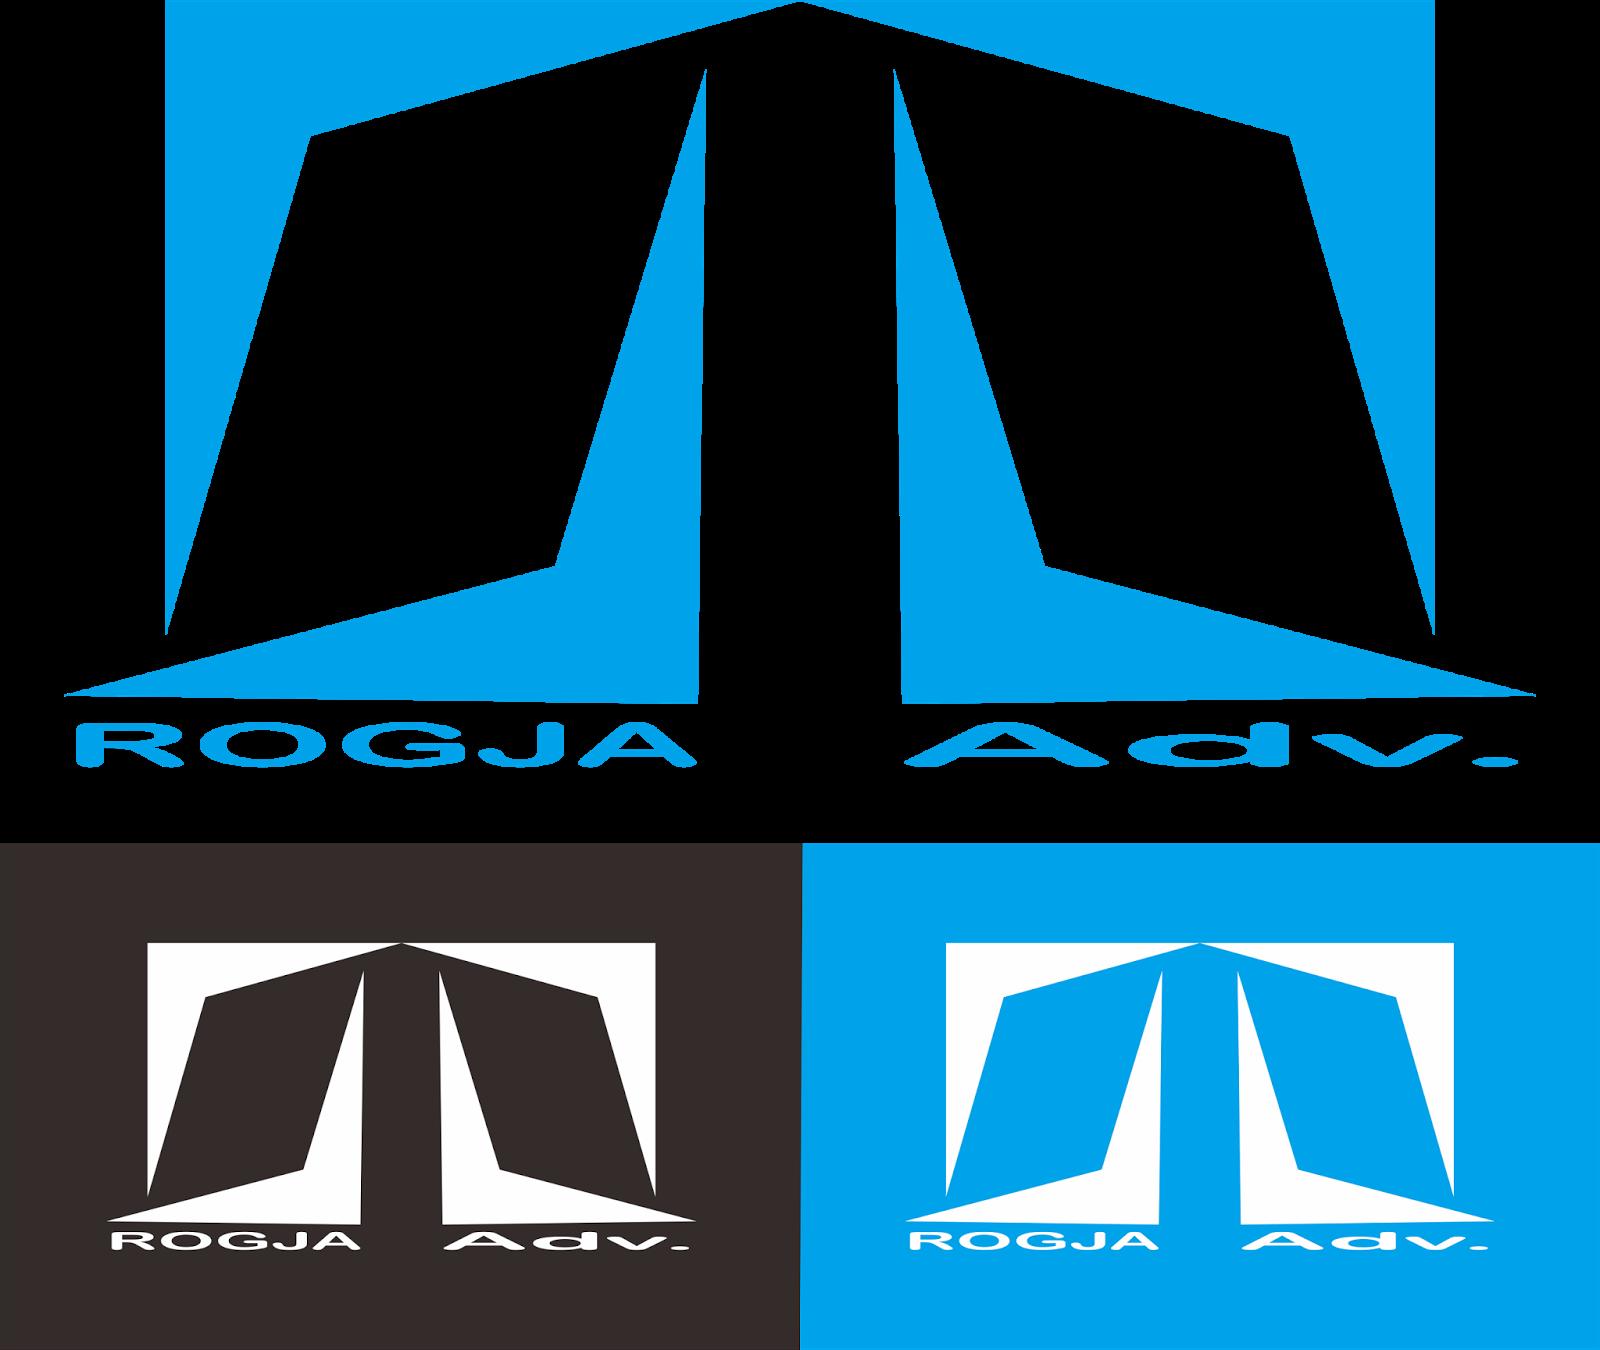 desain grafis logo jogja rogja logo rogja community